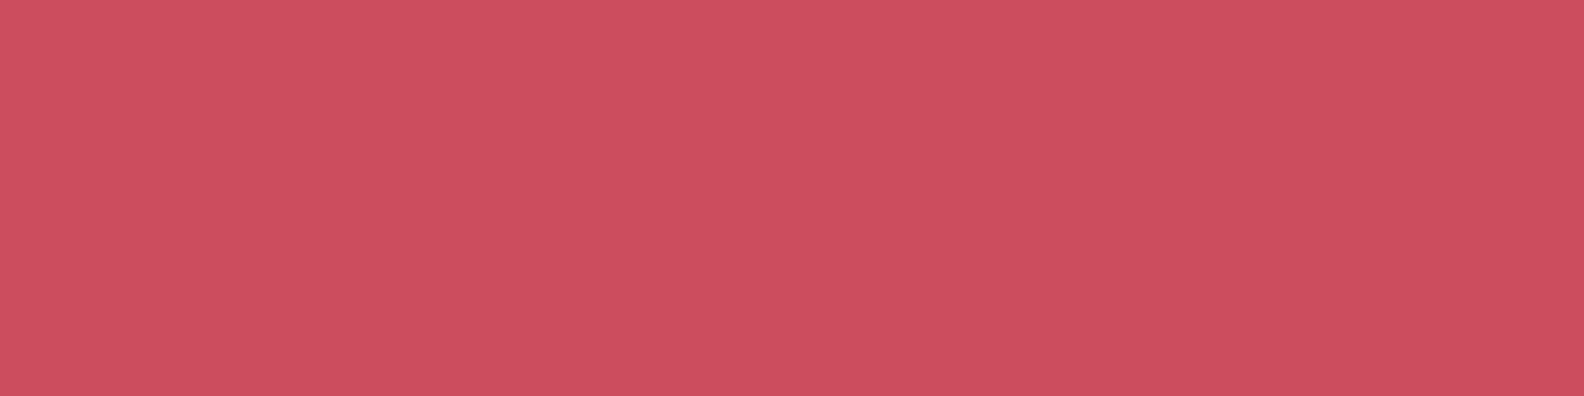 1584x396 Dark Terra Cotta Solid Color Background